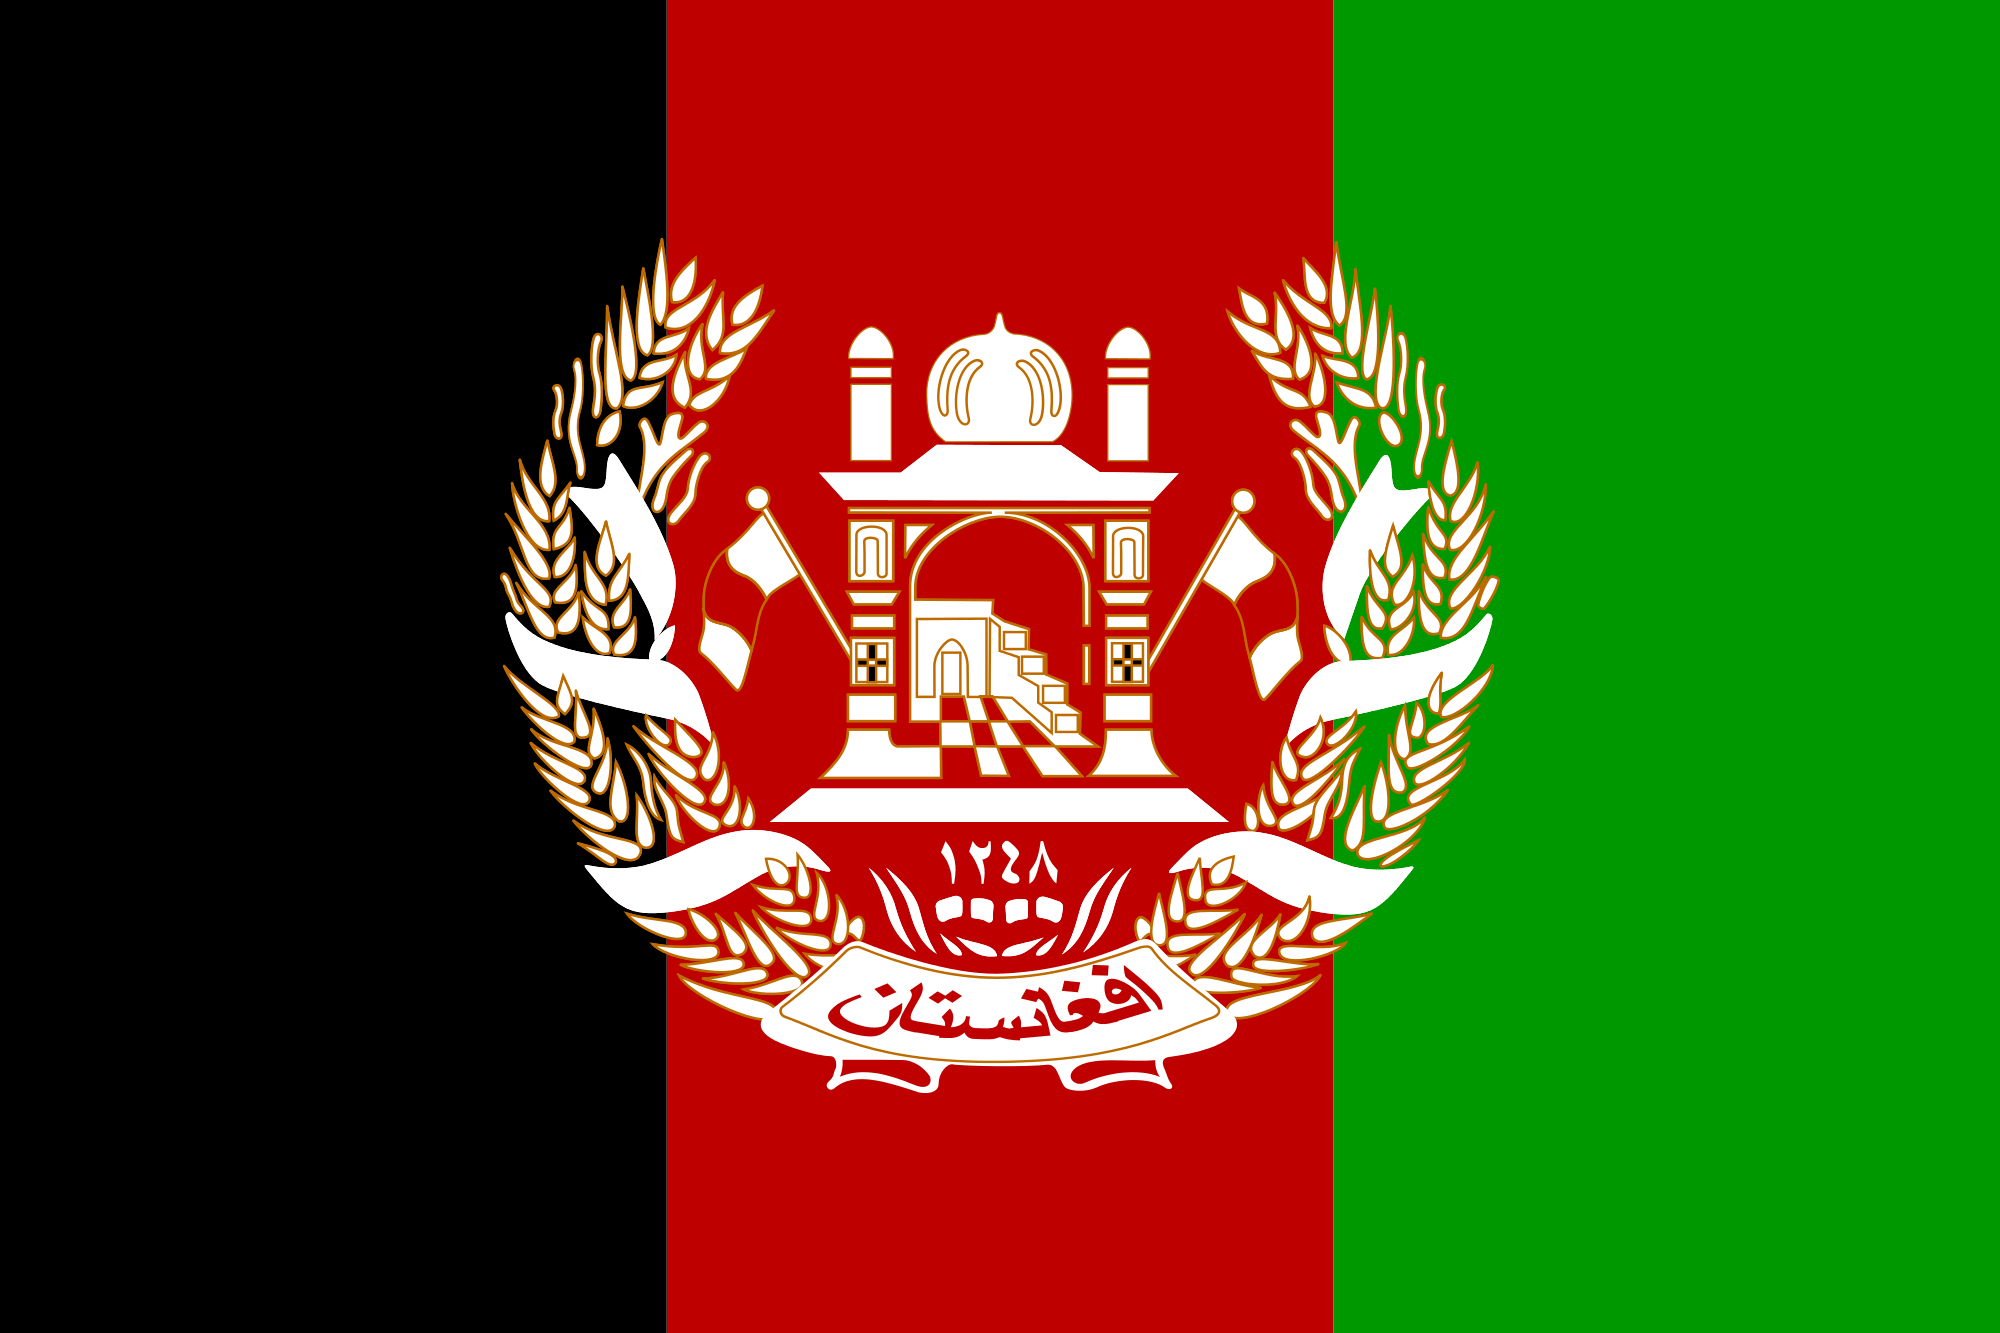 صور علم افغانستان %D8%B9%D9%84%D9%85-%D8%A7%D9%81%D8%BA%D8%A7%D9%86%D8%B3%D8%AA%D8%A7%D9%86